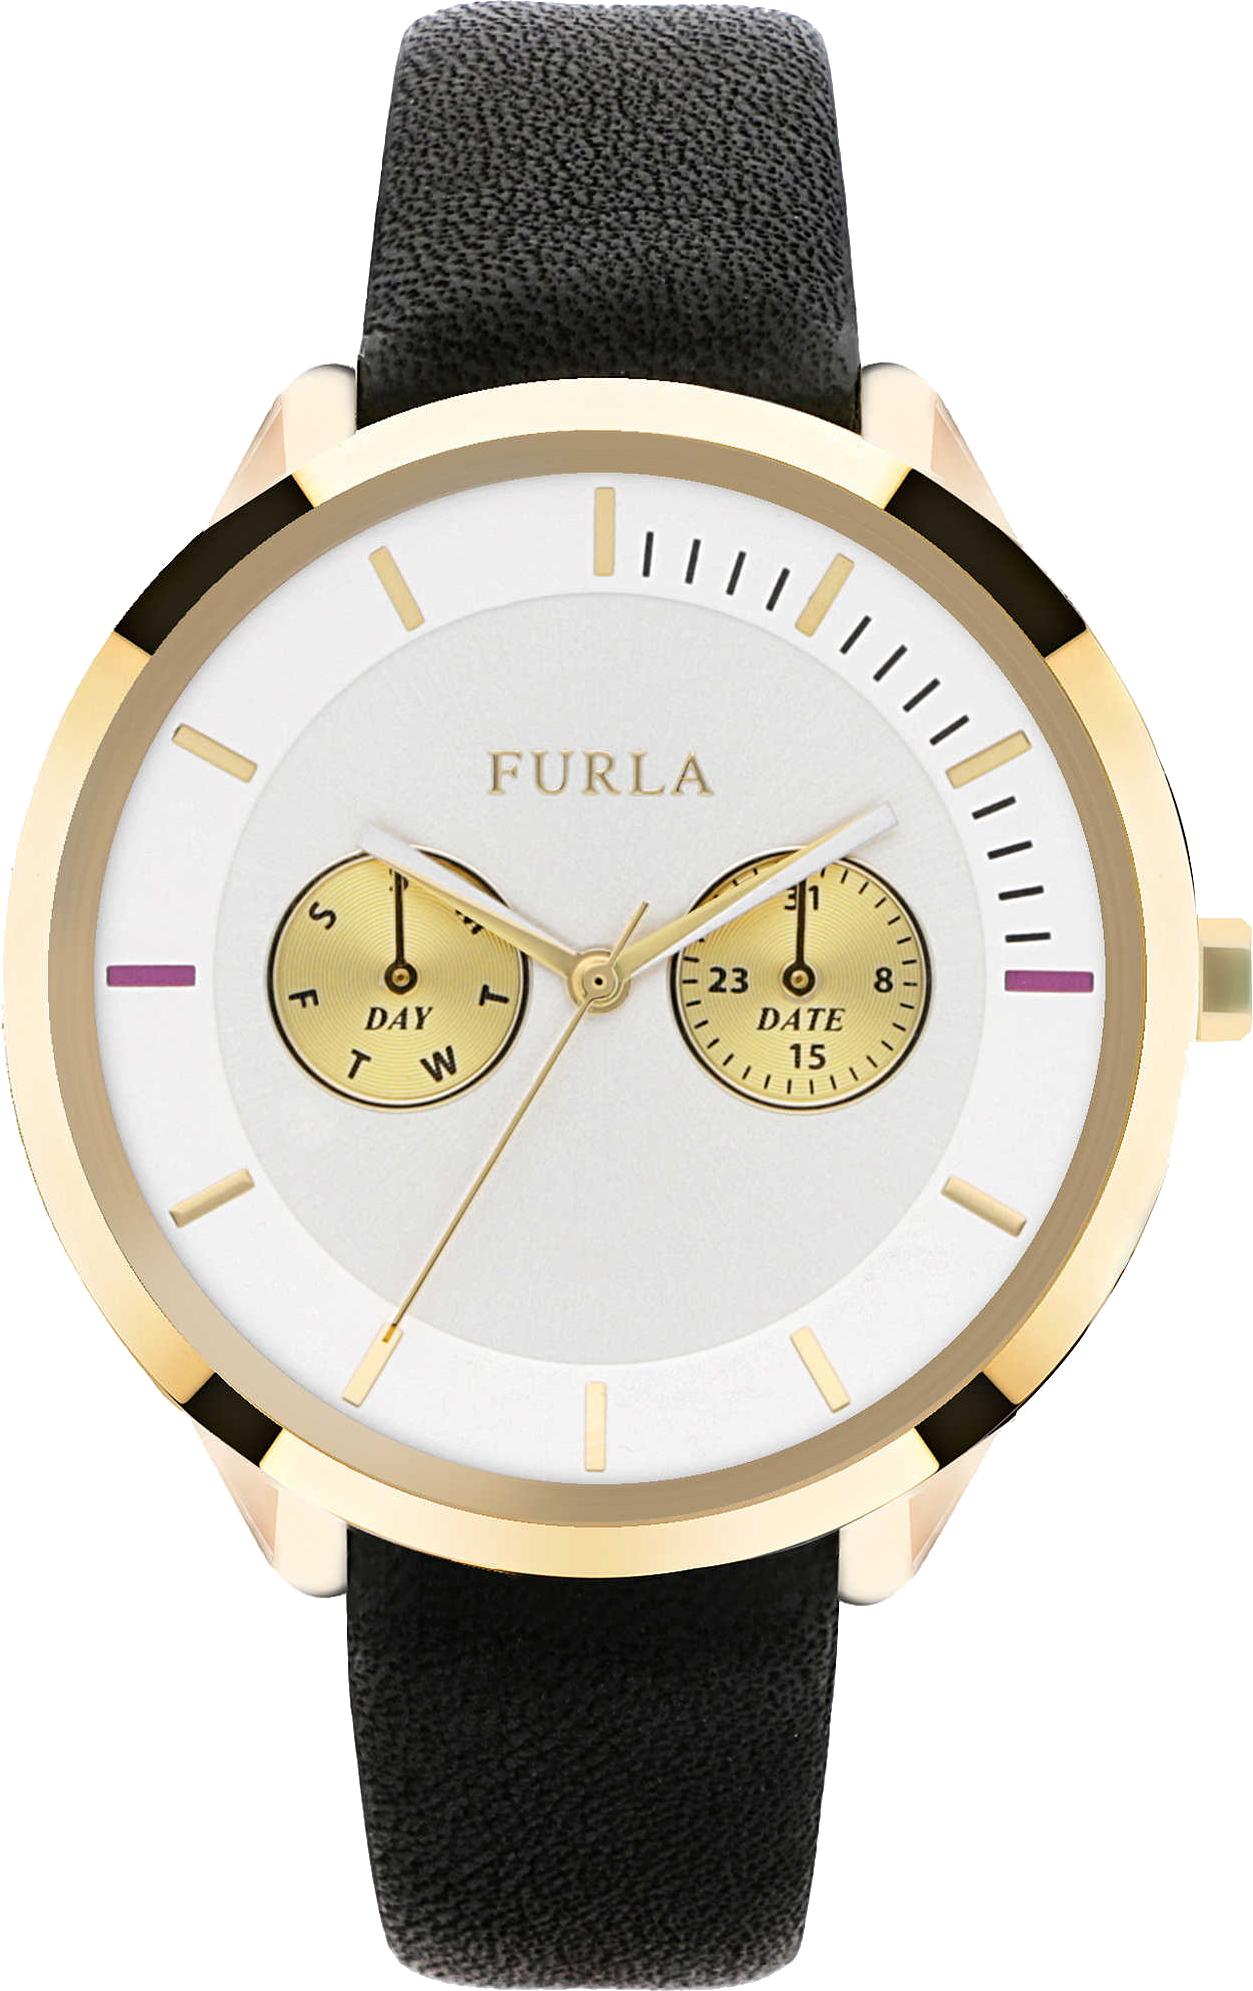 Furla Karóra - Furla női órák akár azonnal be47c63df1